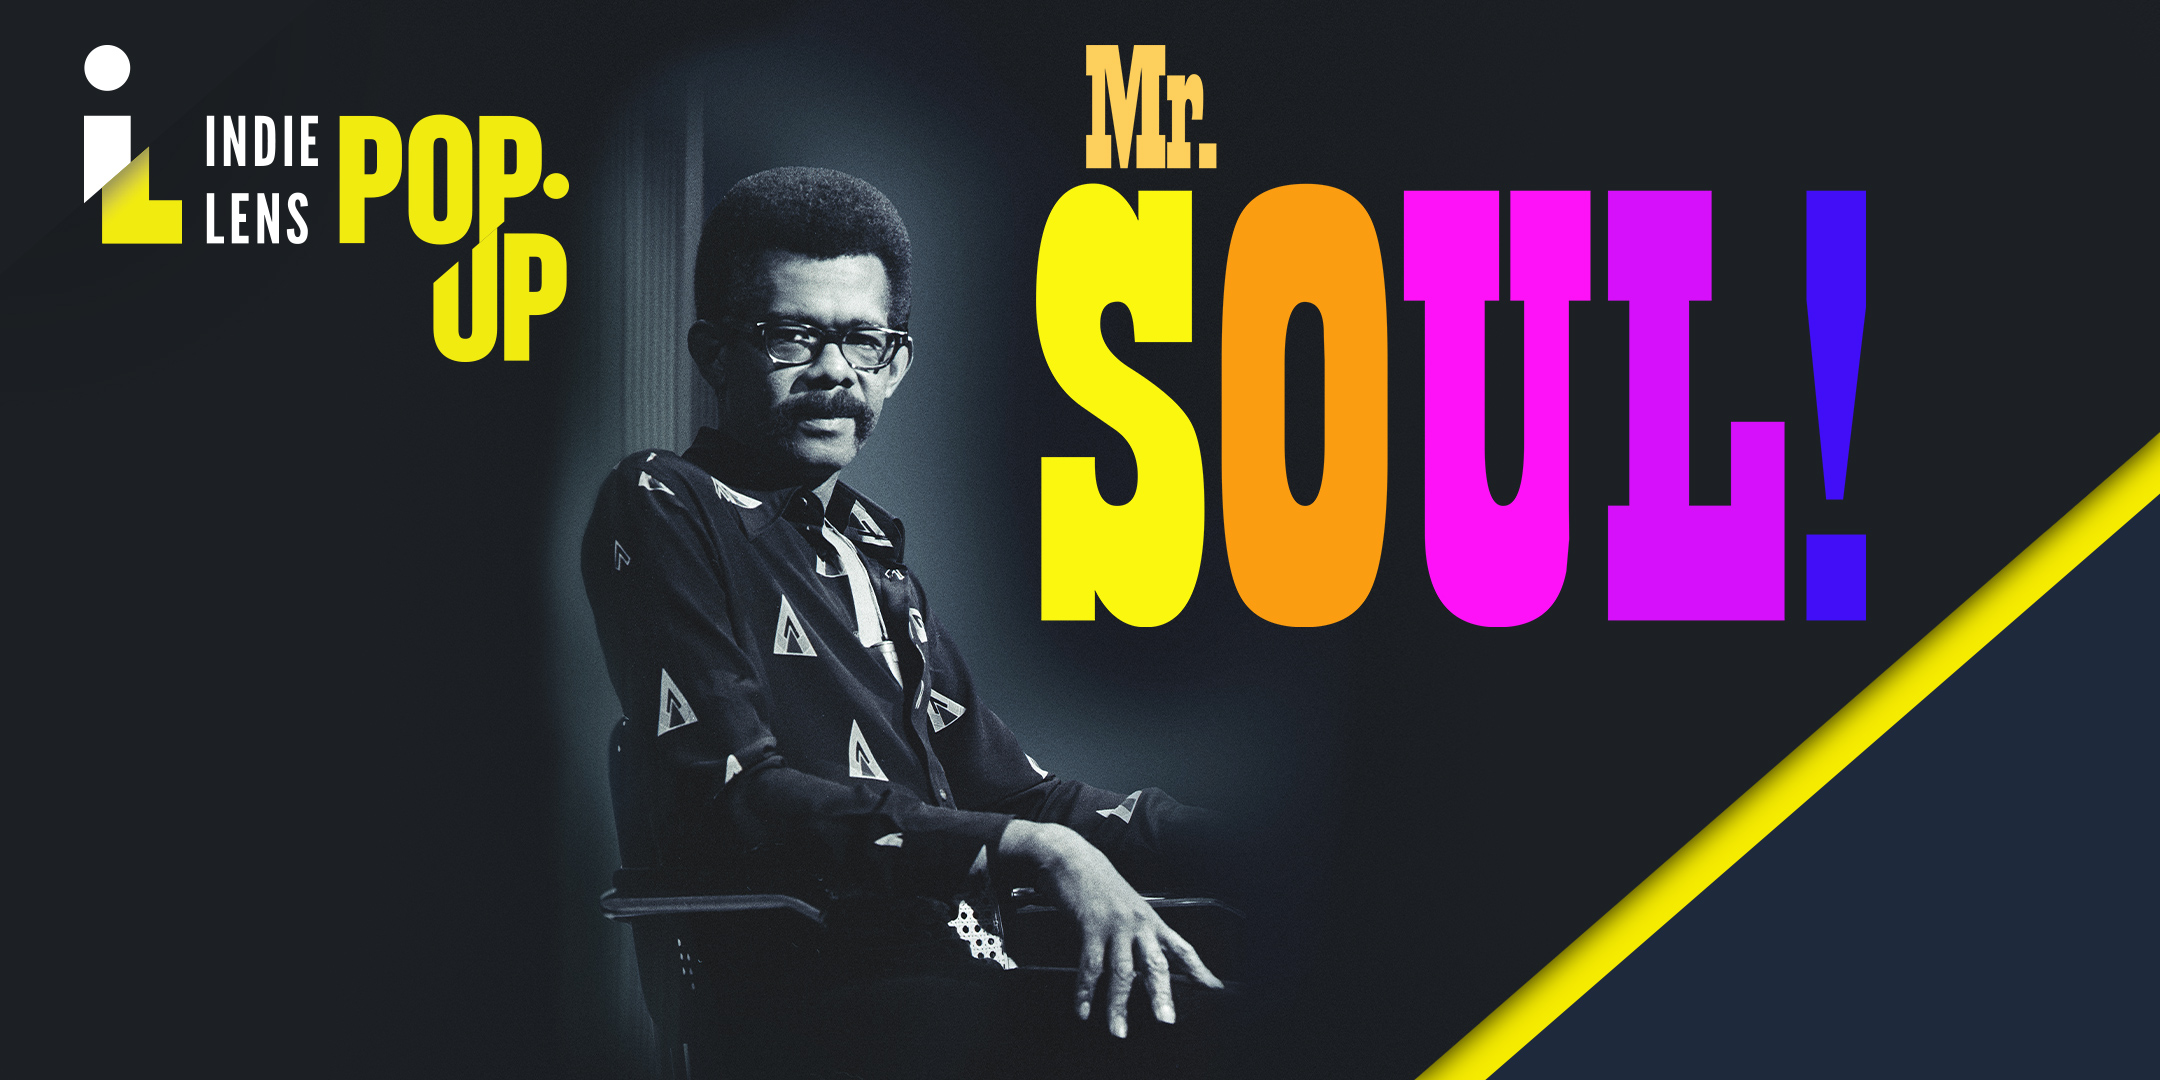 Indie Lens Pop-Up: Mr. SOUL!